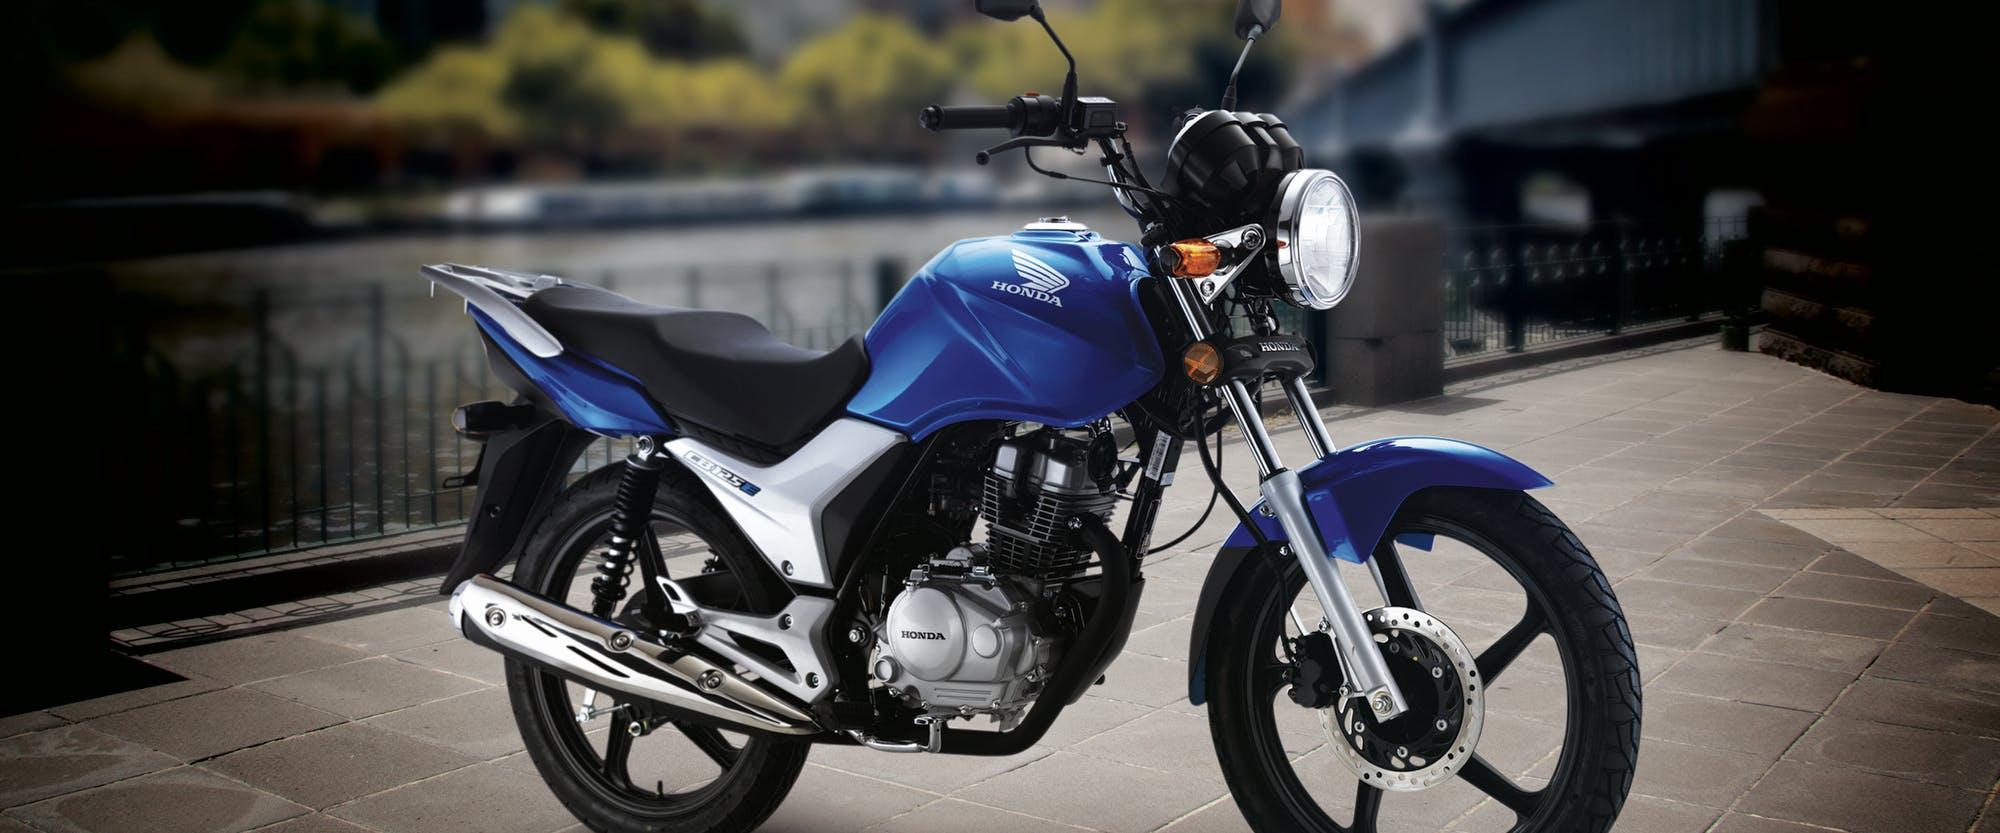 Honda CB125E in glint wave blue metallic colour, parked